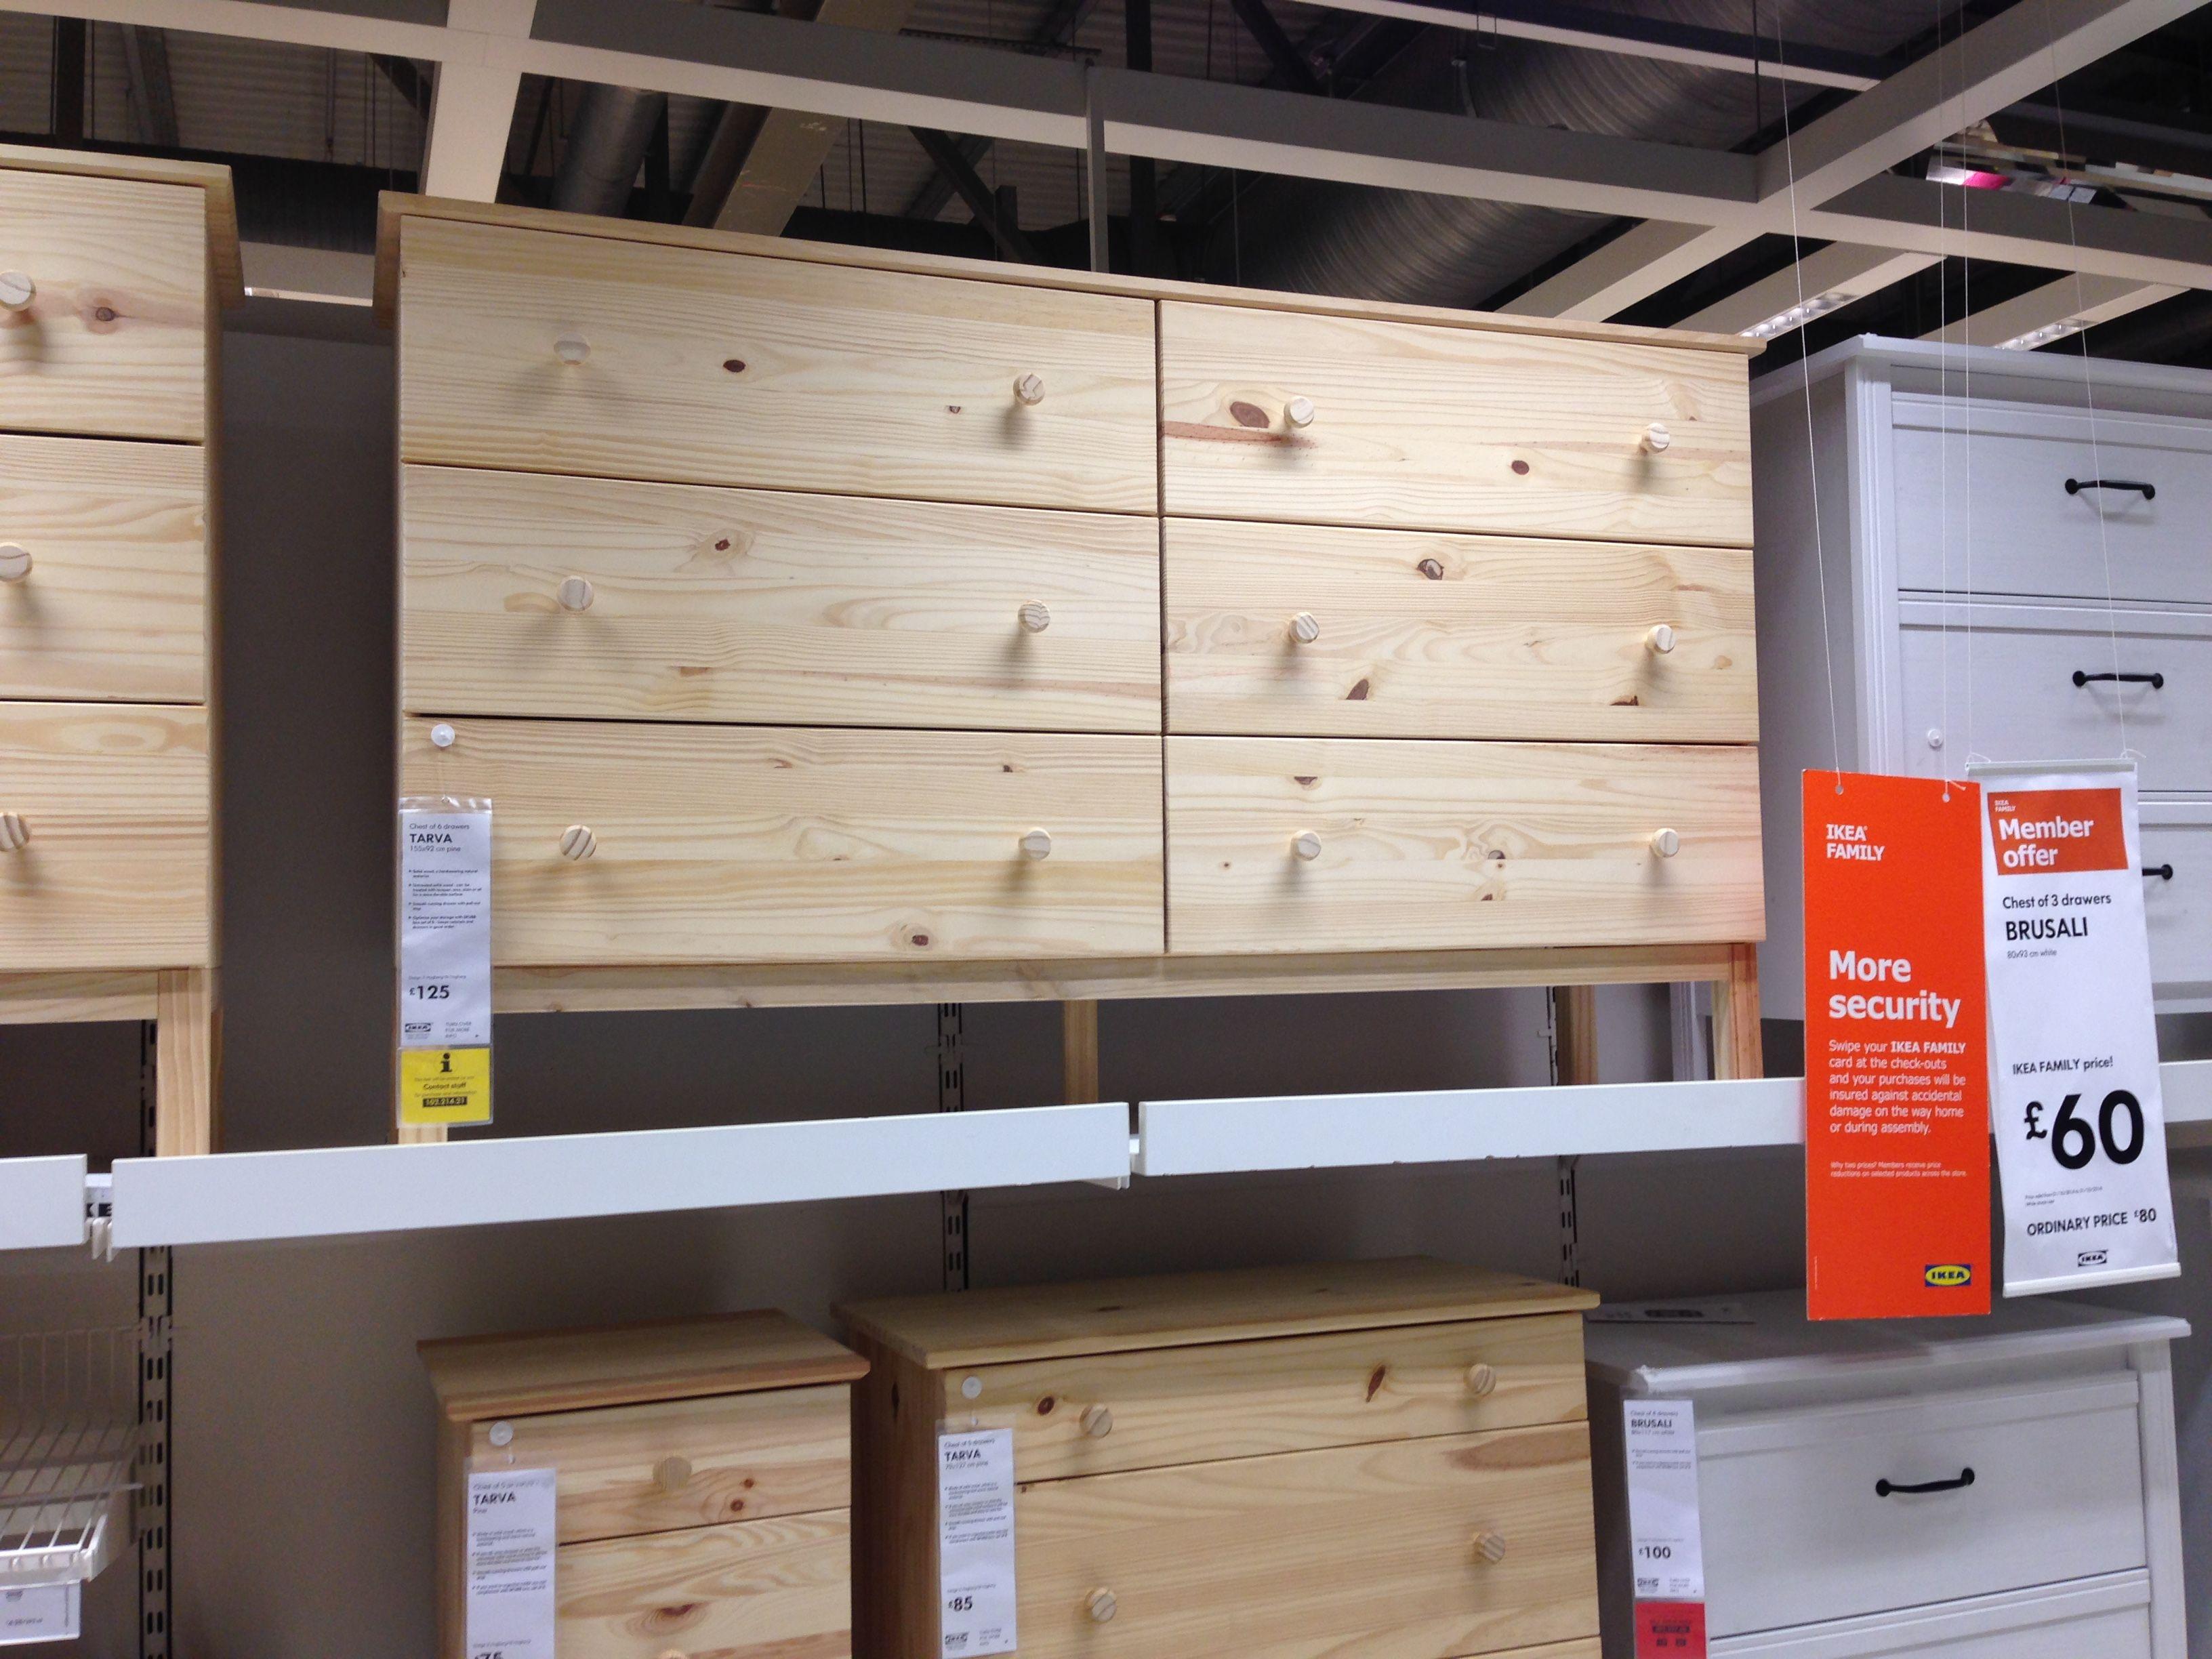 Tarva chest of 6 drawers IKEA 155 x 92 £125 untreated pine that